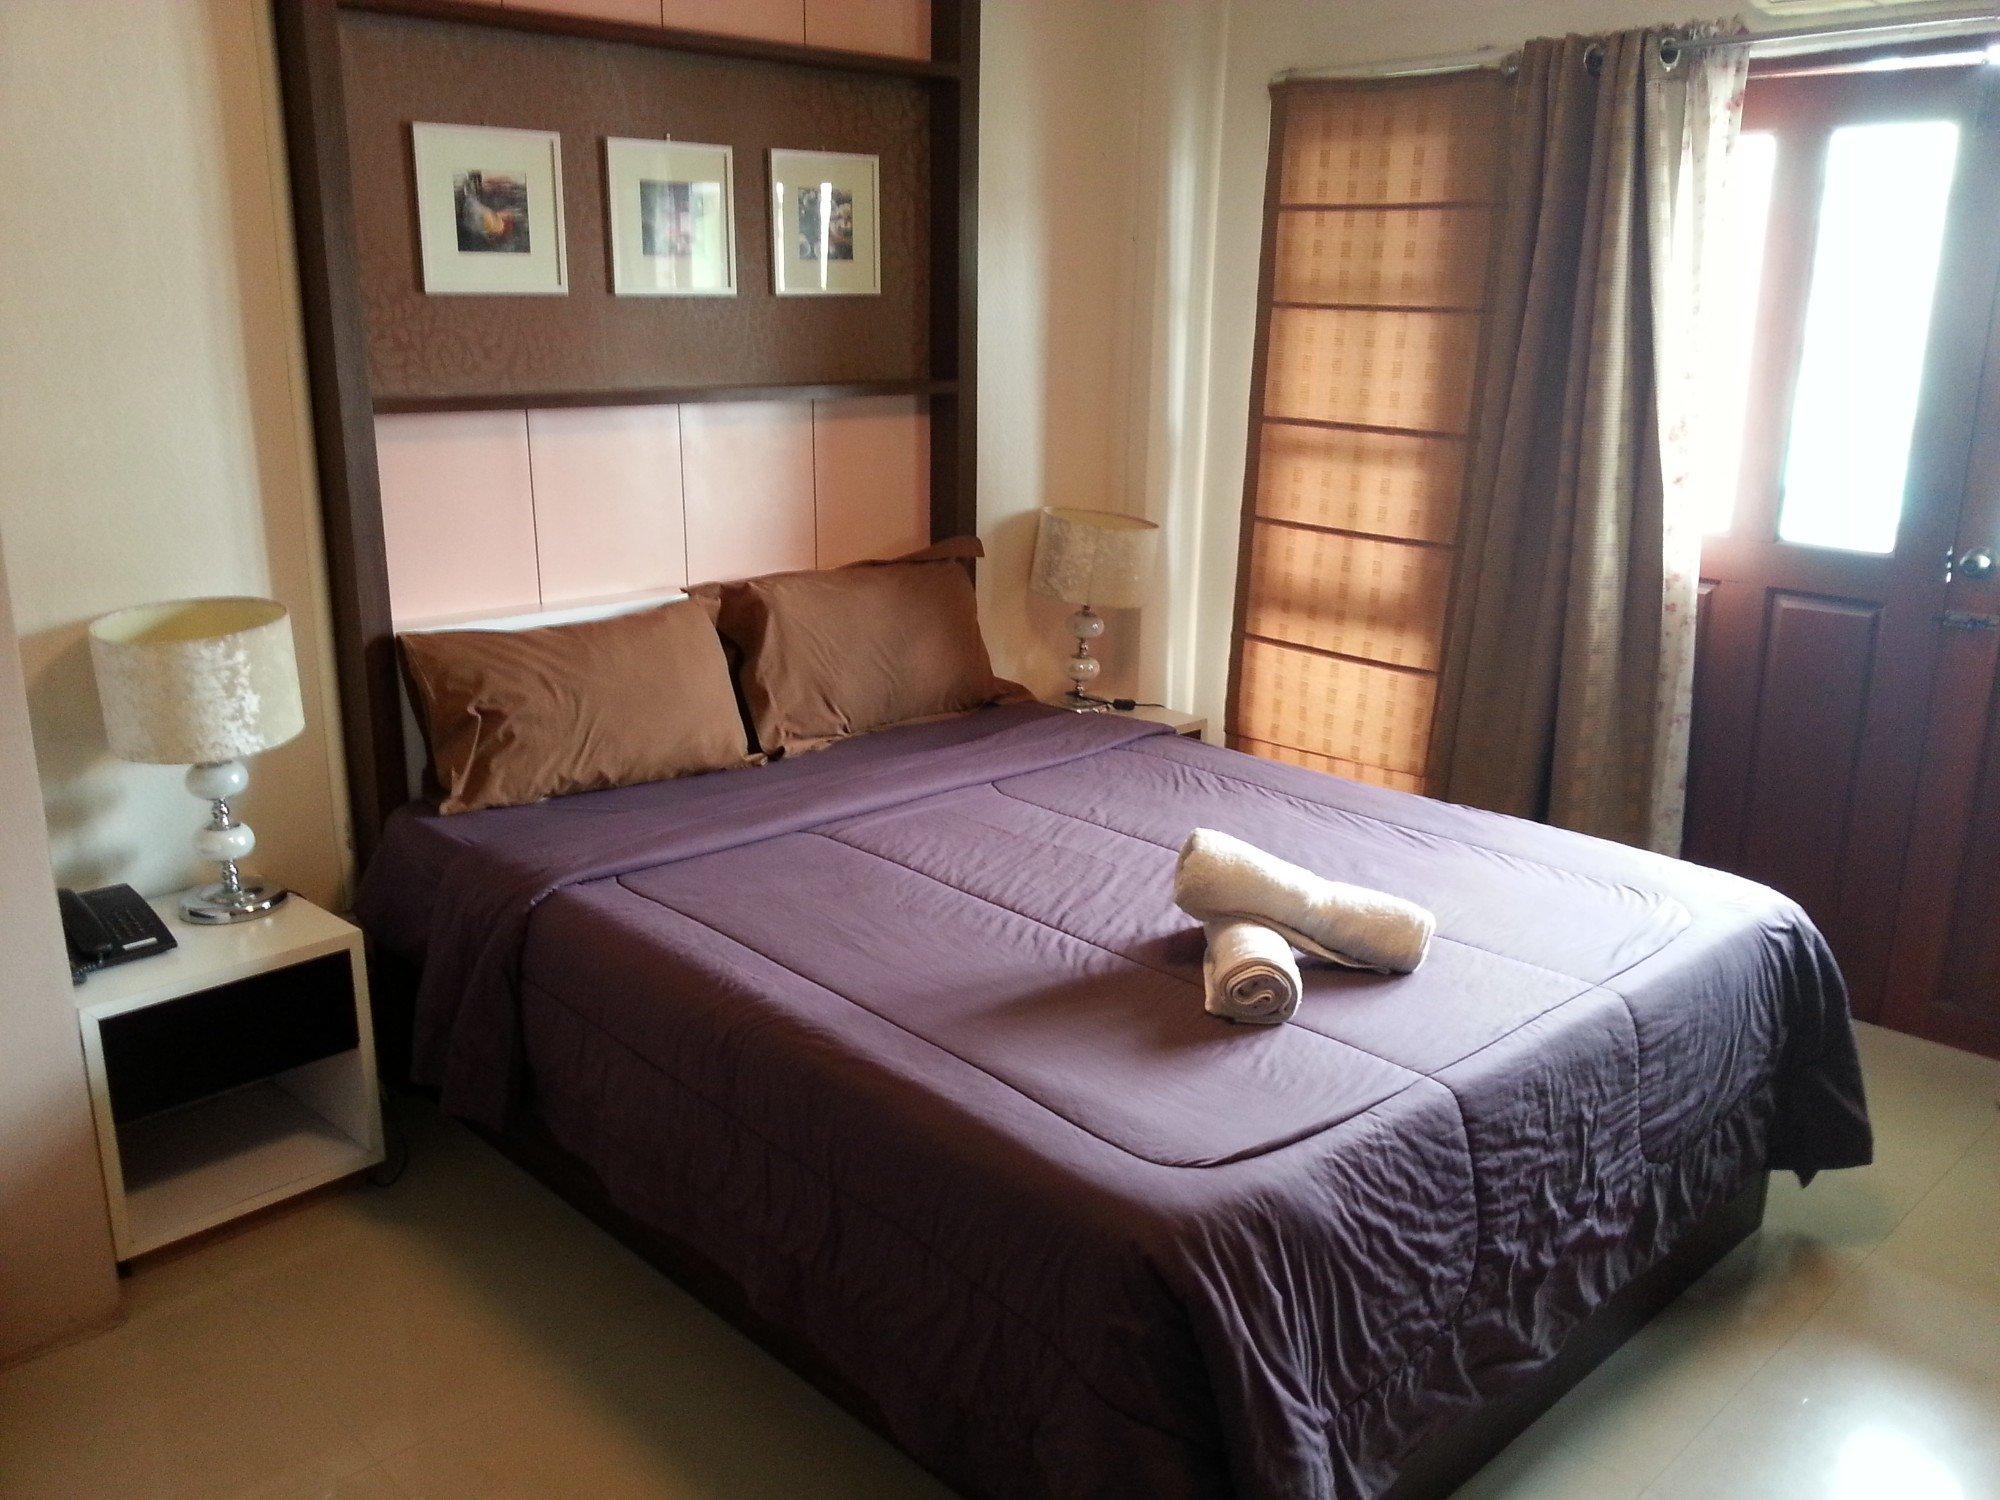 Bed at the Baan Chiang Rai Guest House